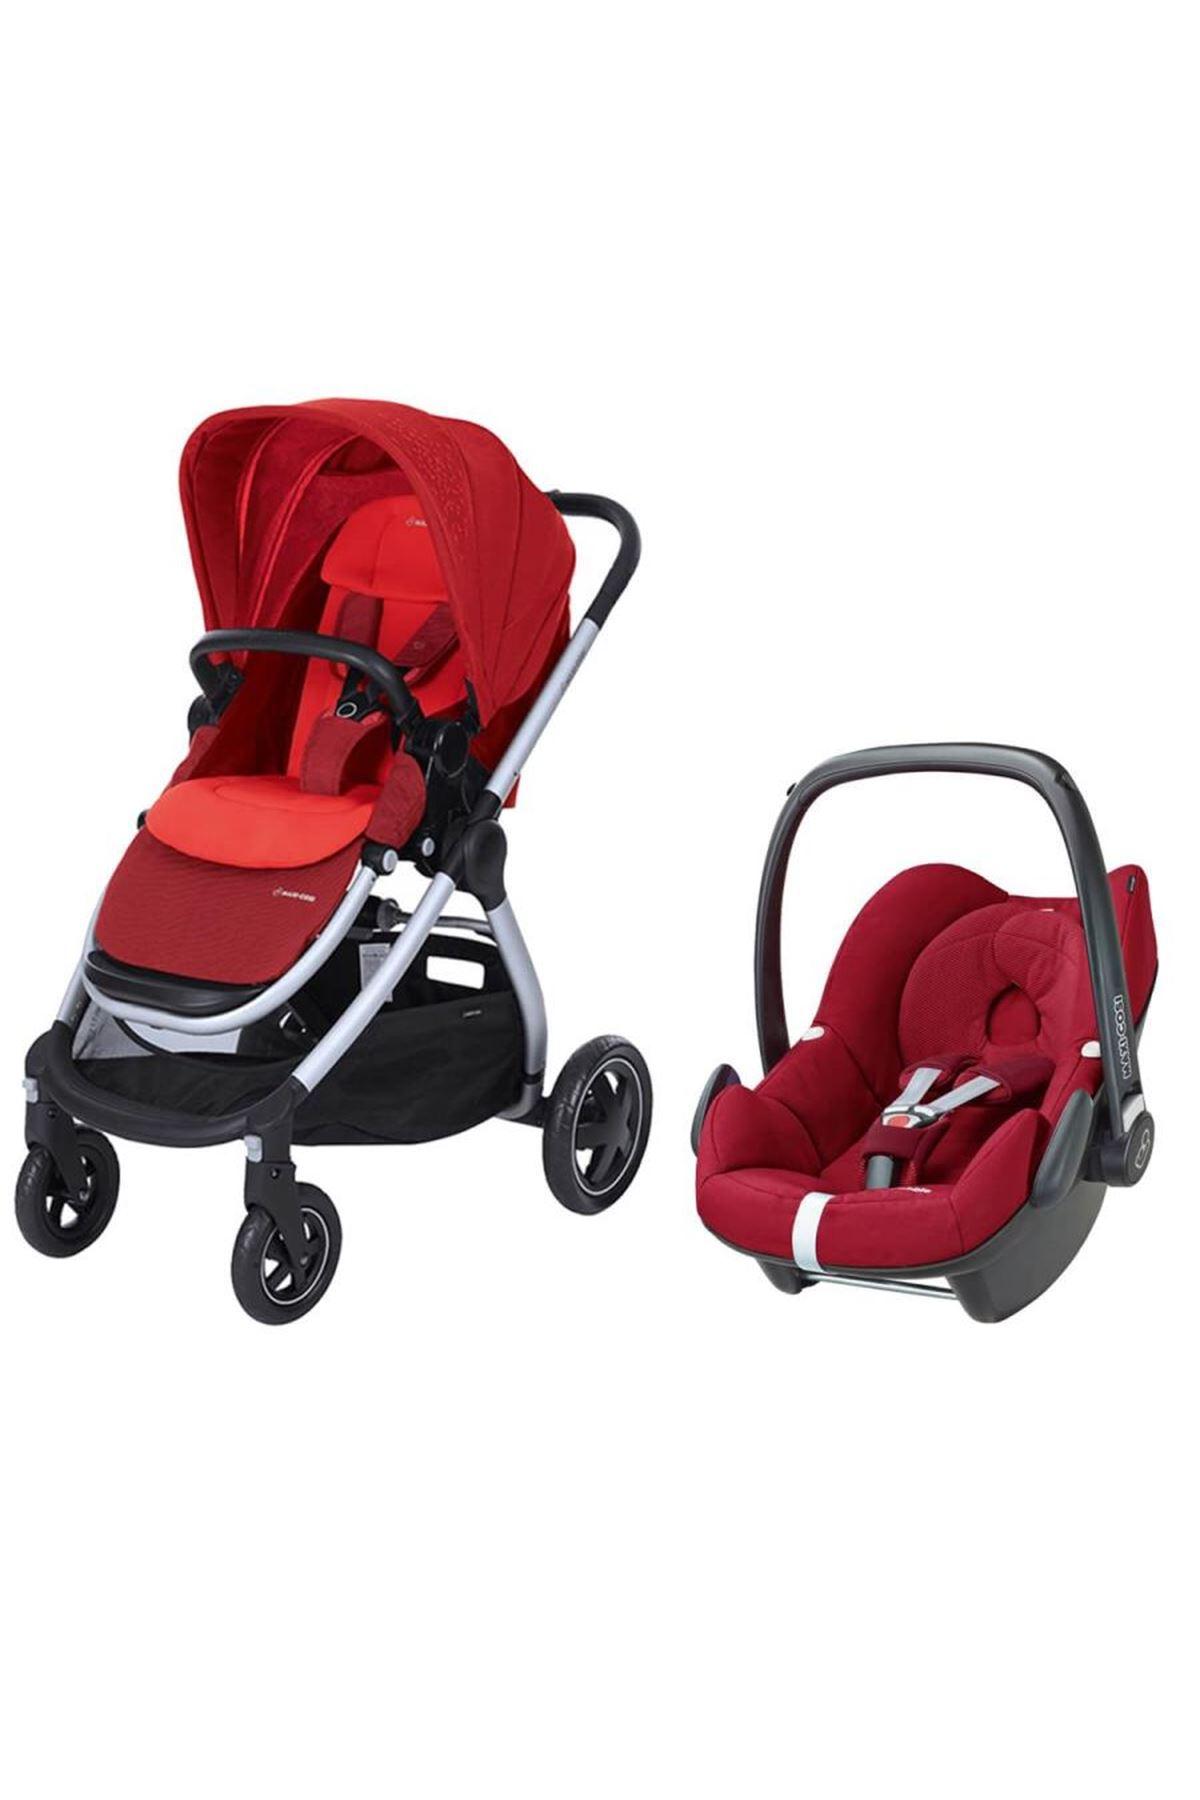 Maxi-Cosi Adorra Travel Sistem Bebek Arabası / Vivid Red